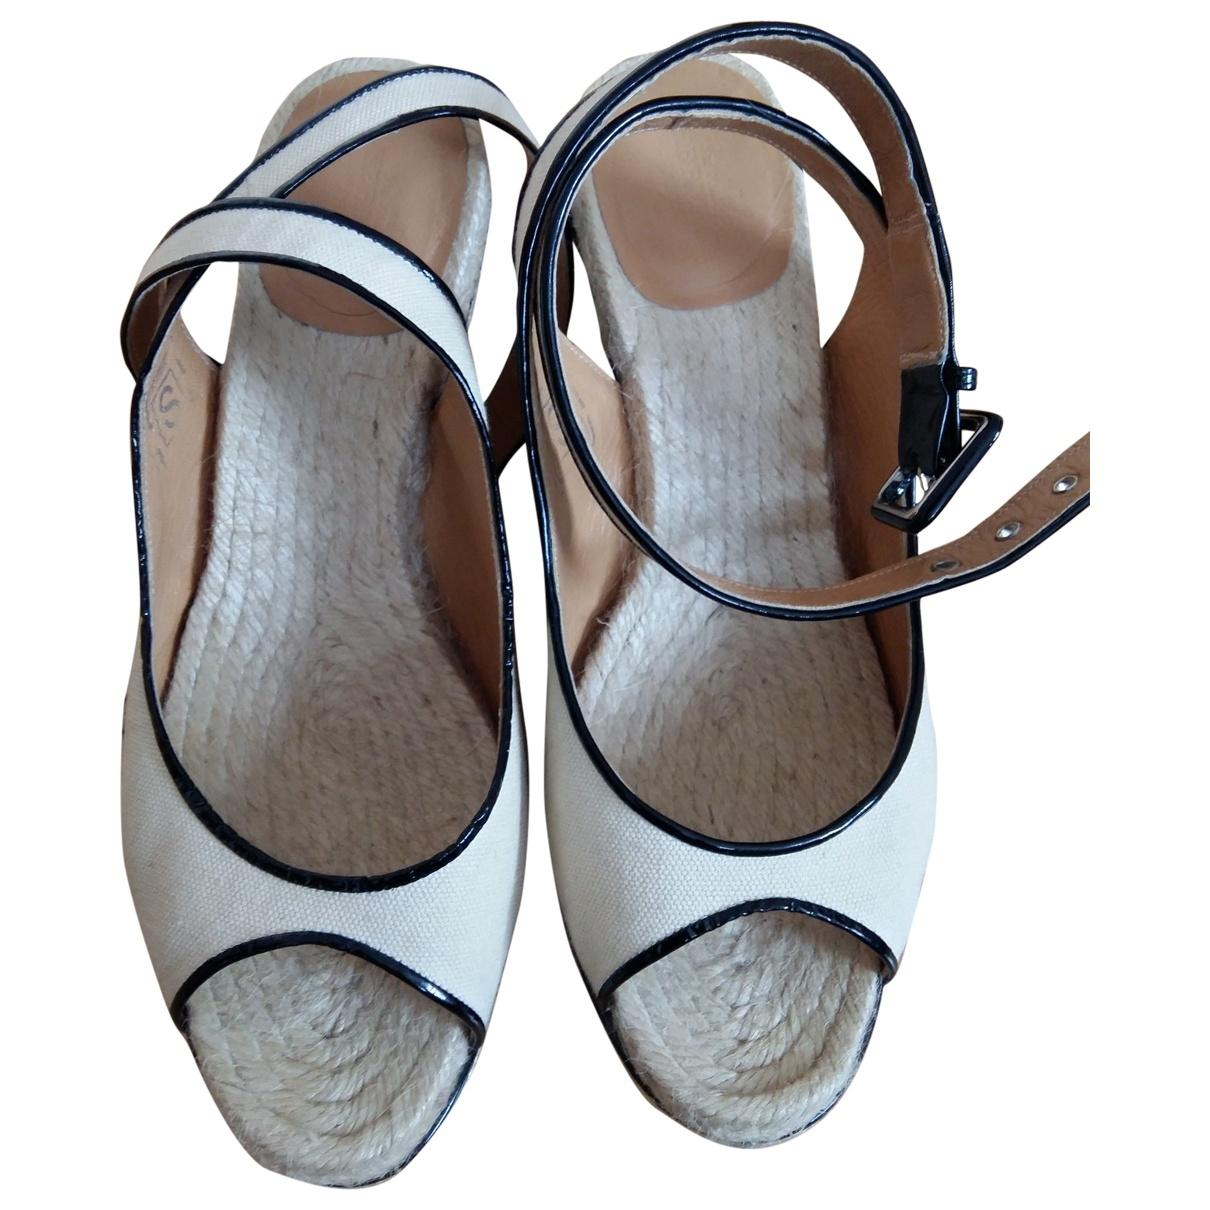 Hermès \N Beige Cloth Espadrilles for Women 40 EU